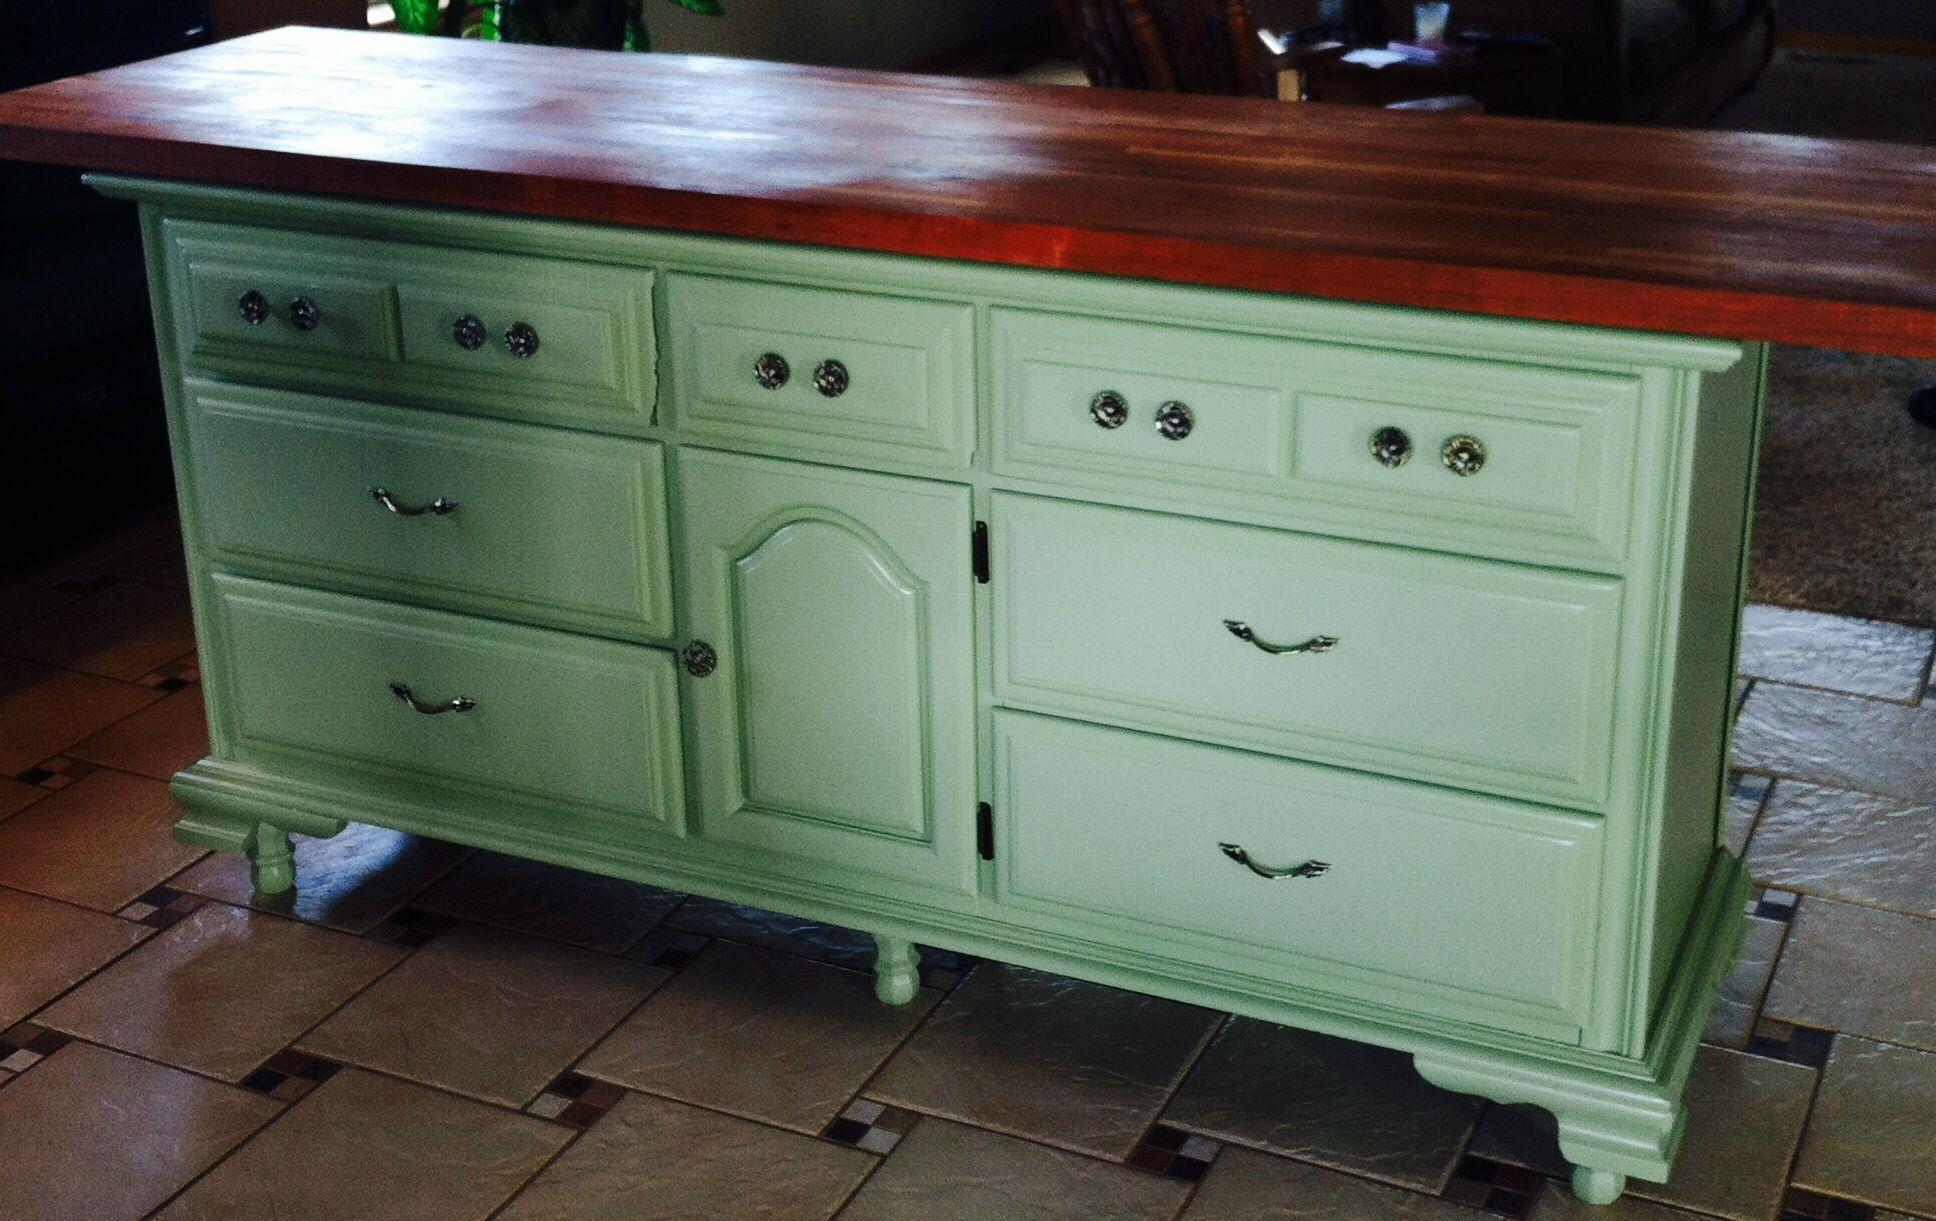 DIY kitchen island transformed from old dresser | Furniture ... on